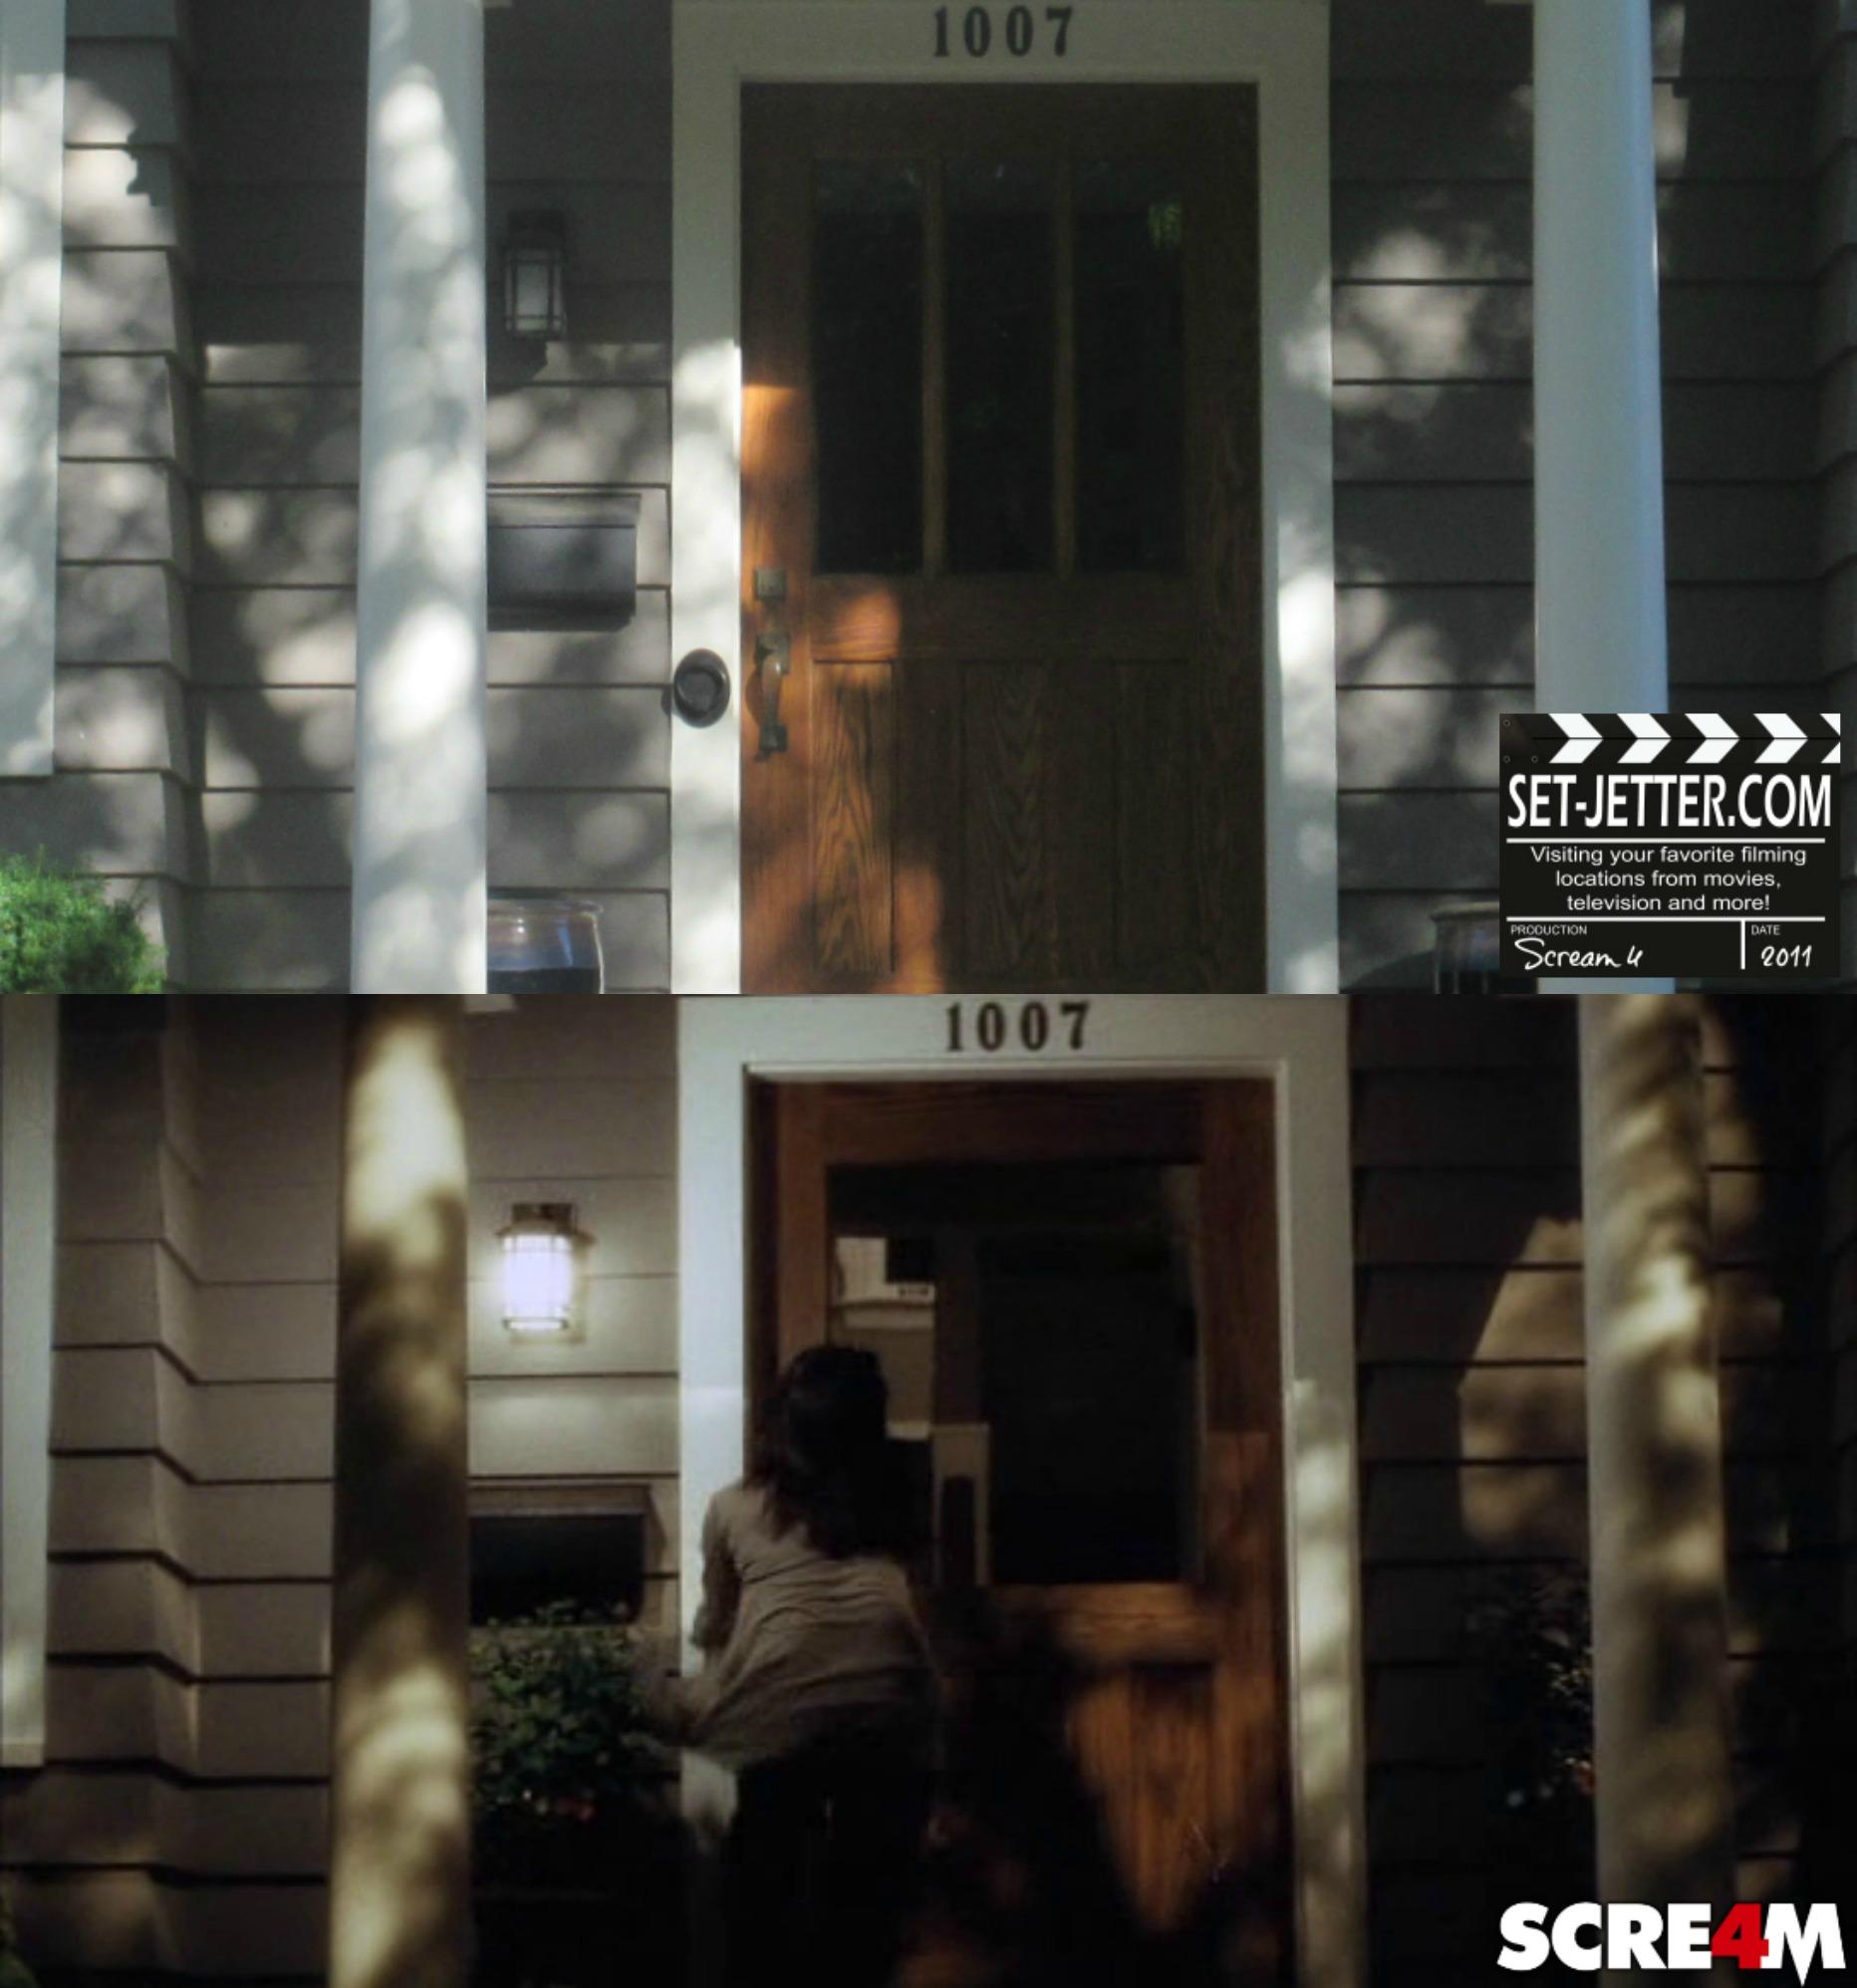 Scream4 comparison 121.jpg